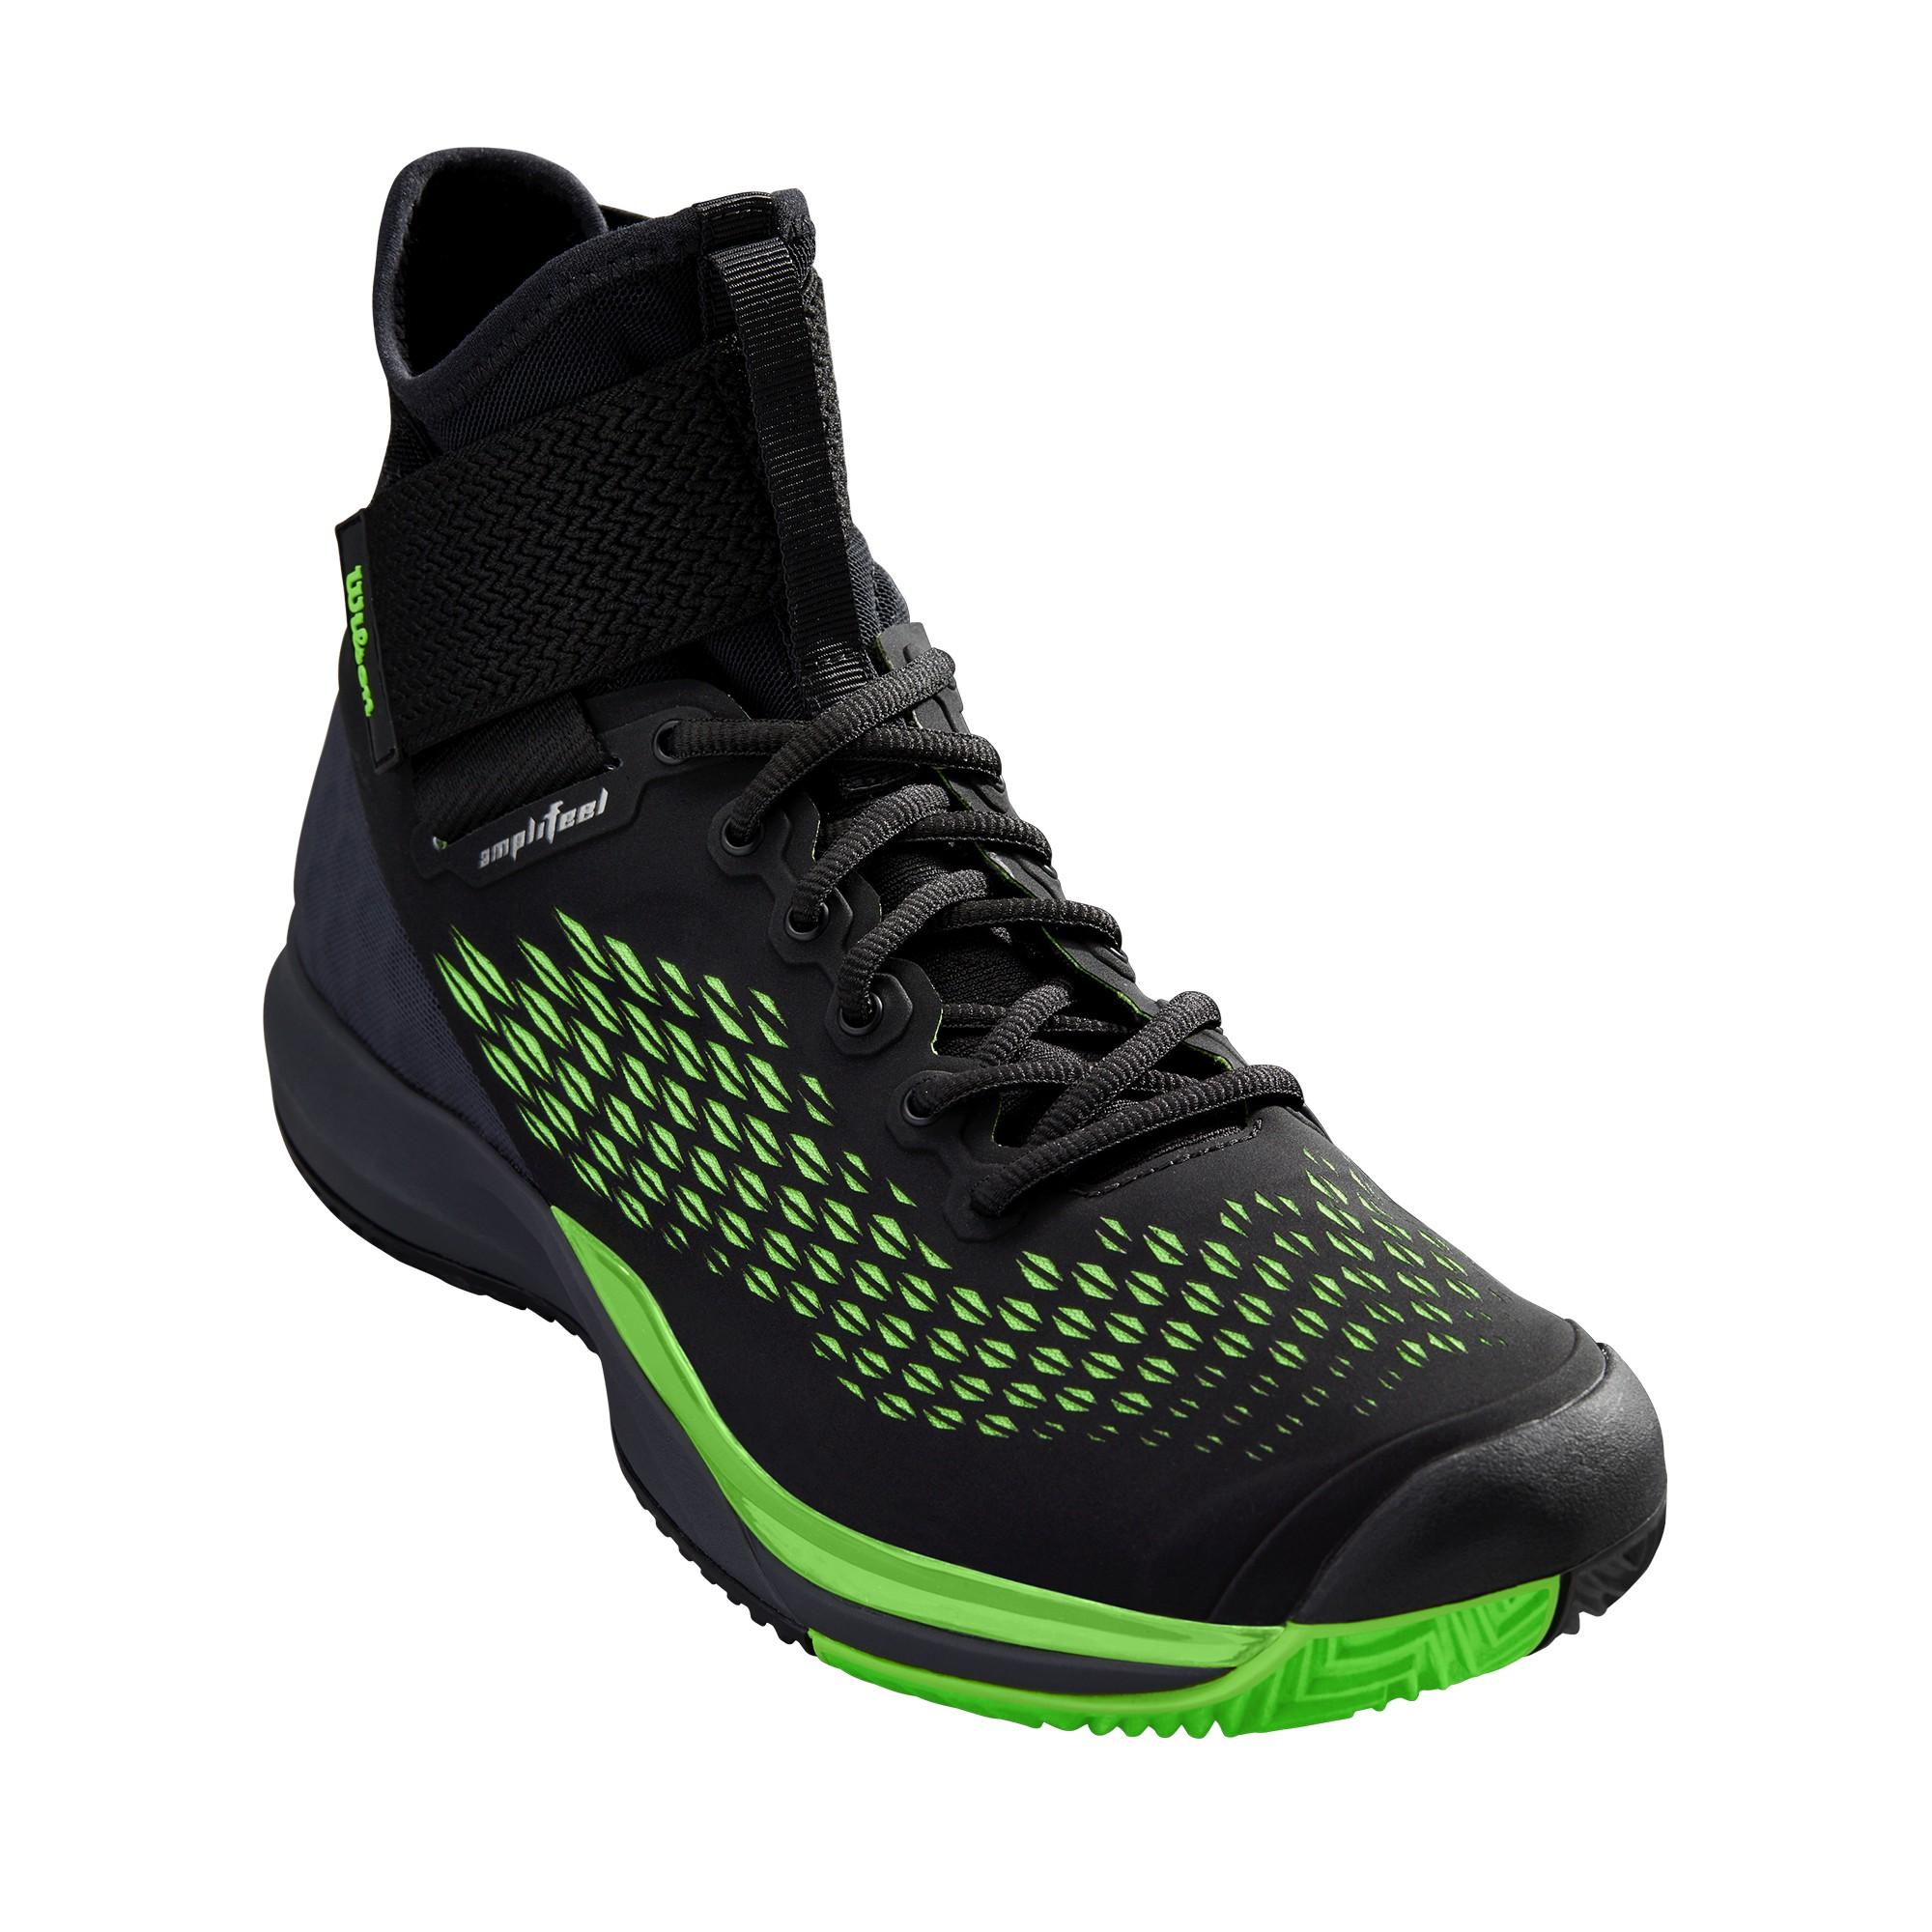 Wilson Amplifeel 2.0 tennis shoes have